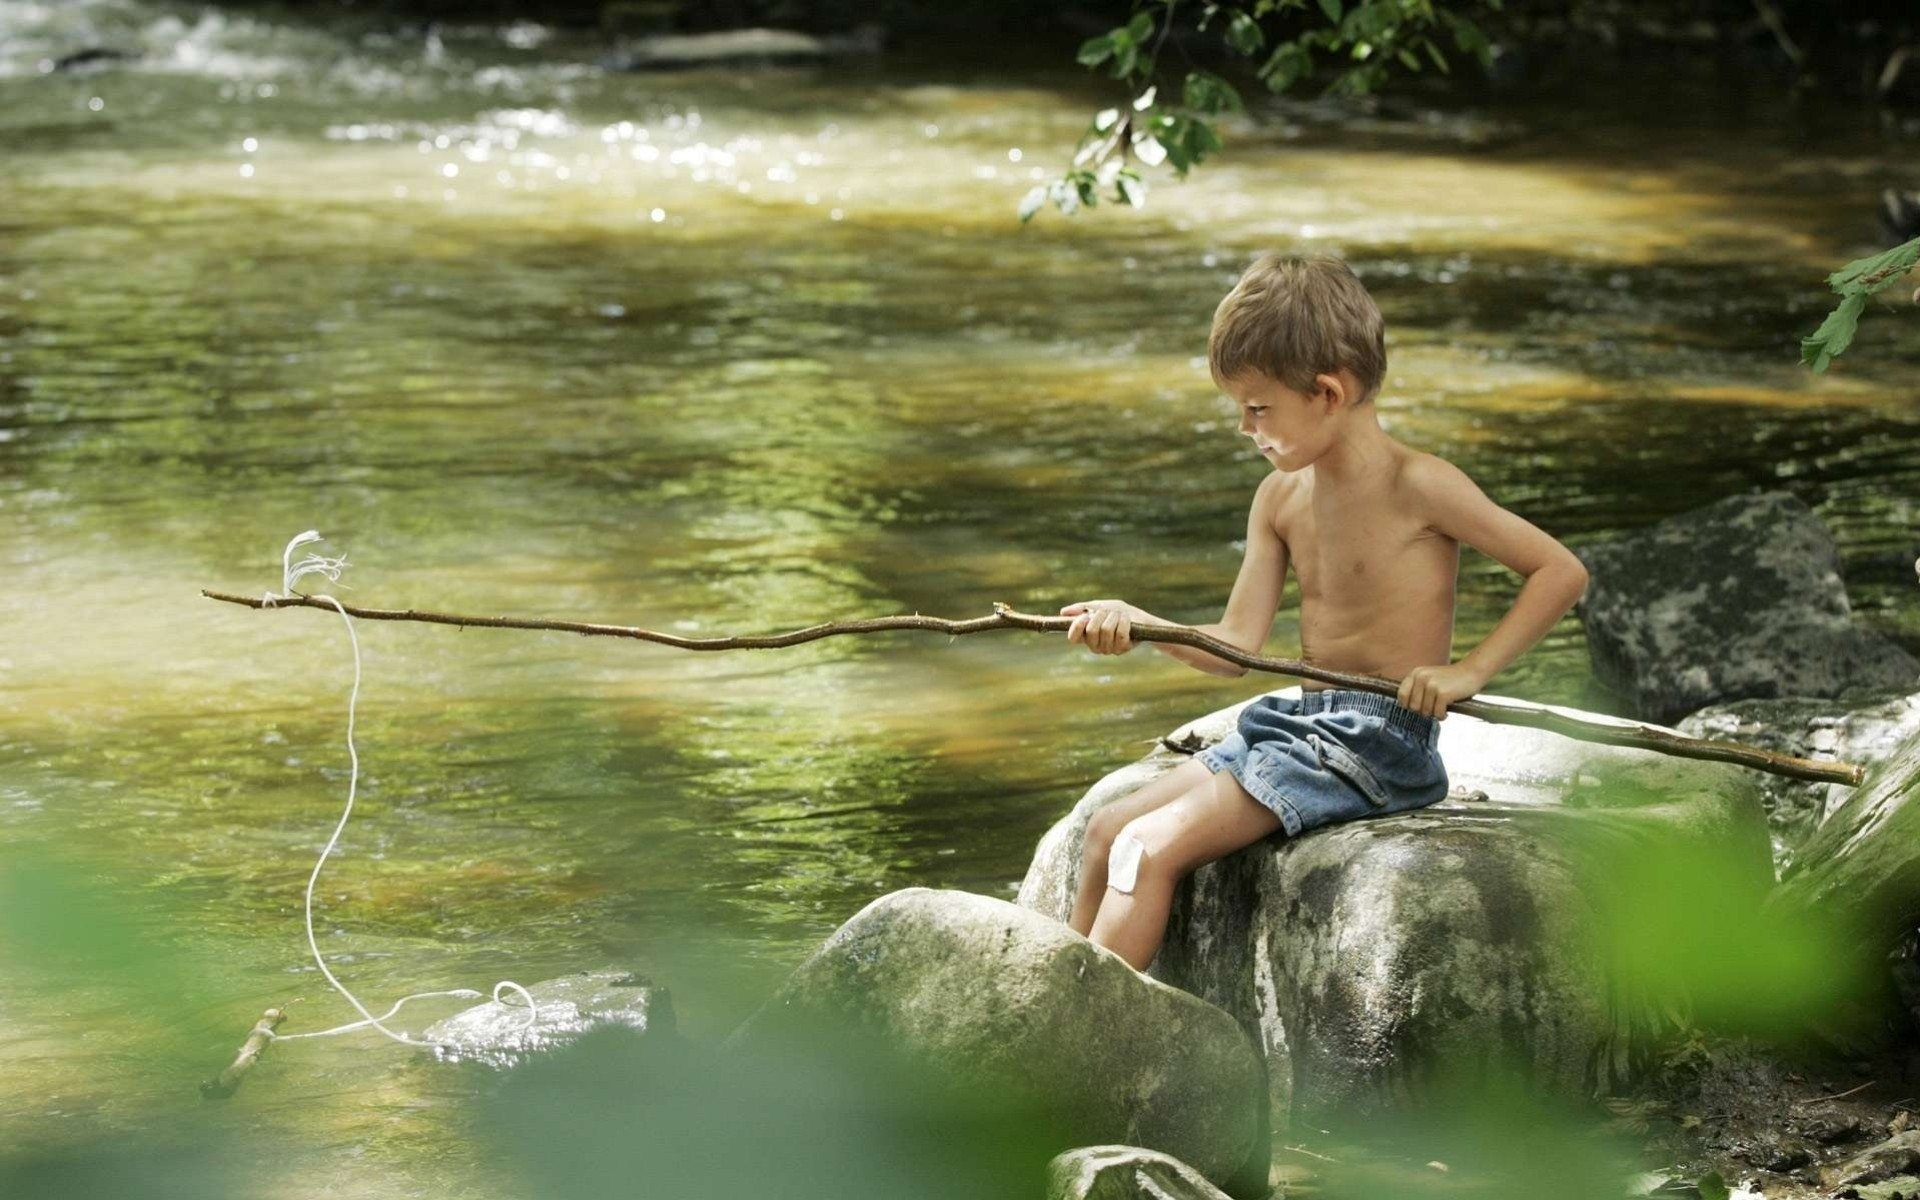 рыбалка как реабилитация